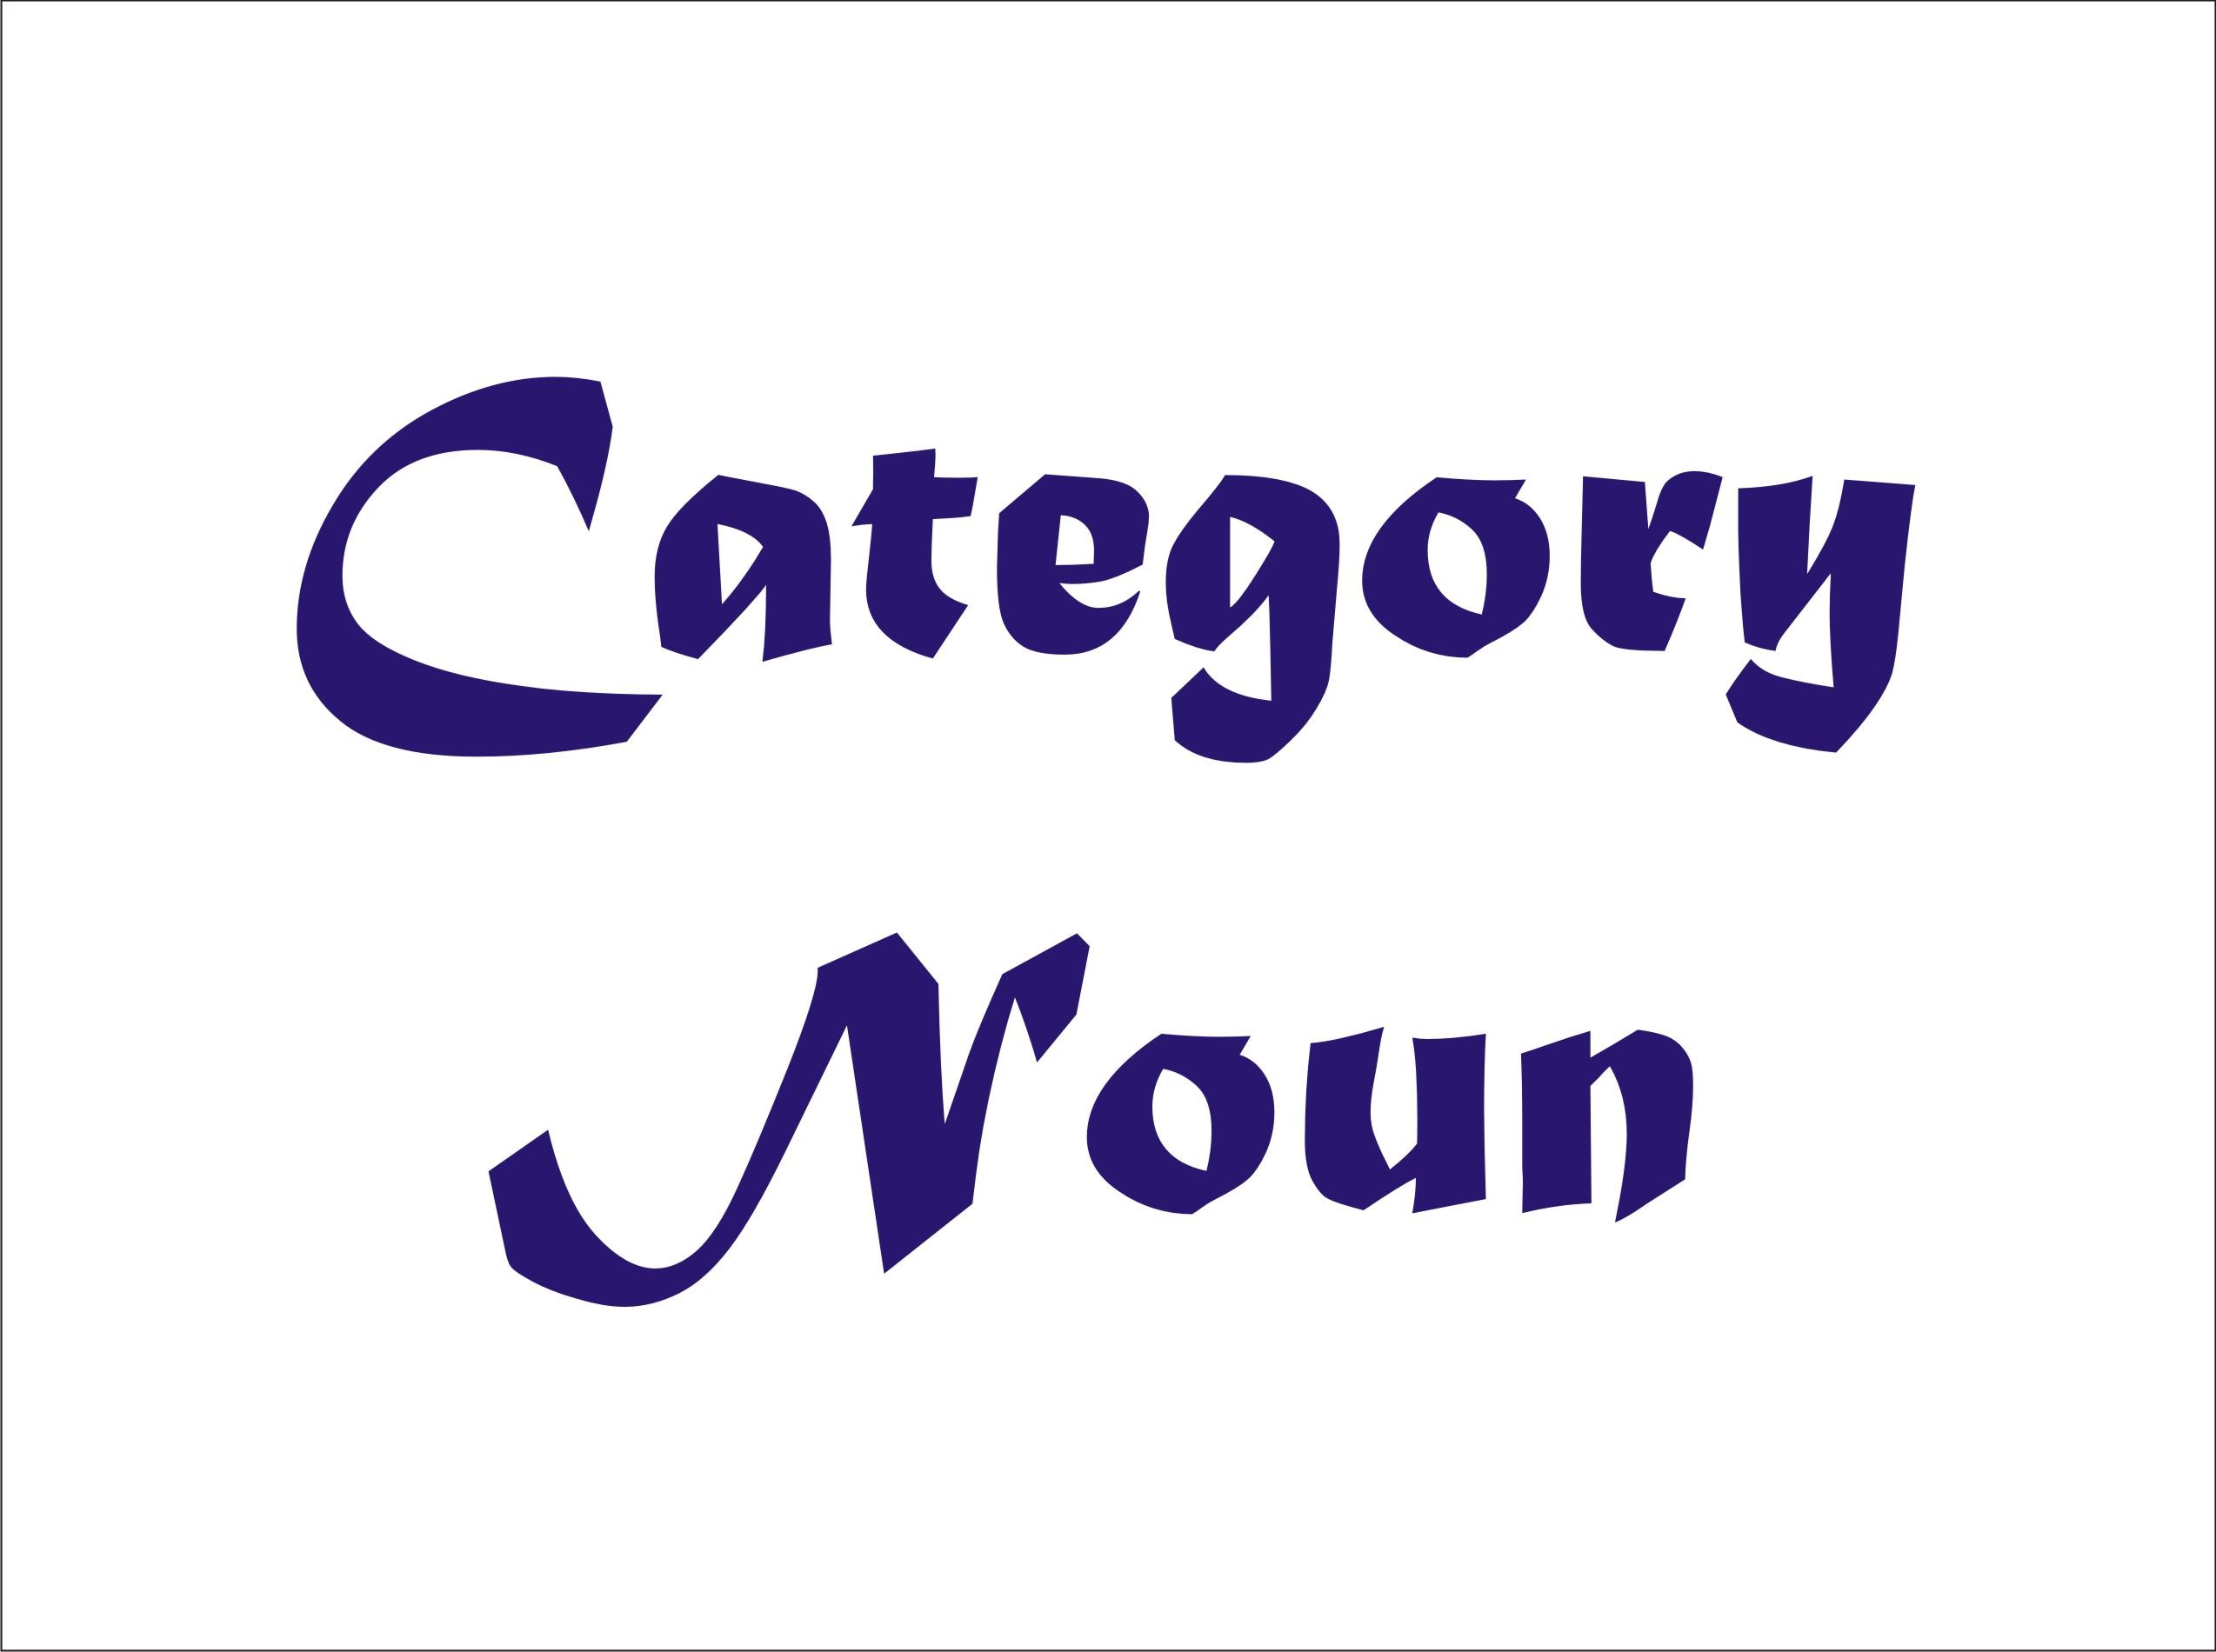 Category Noun